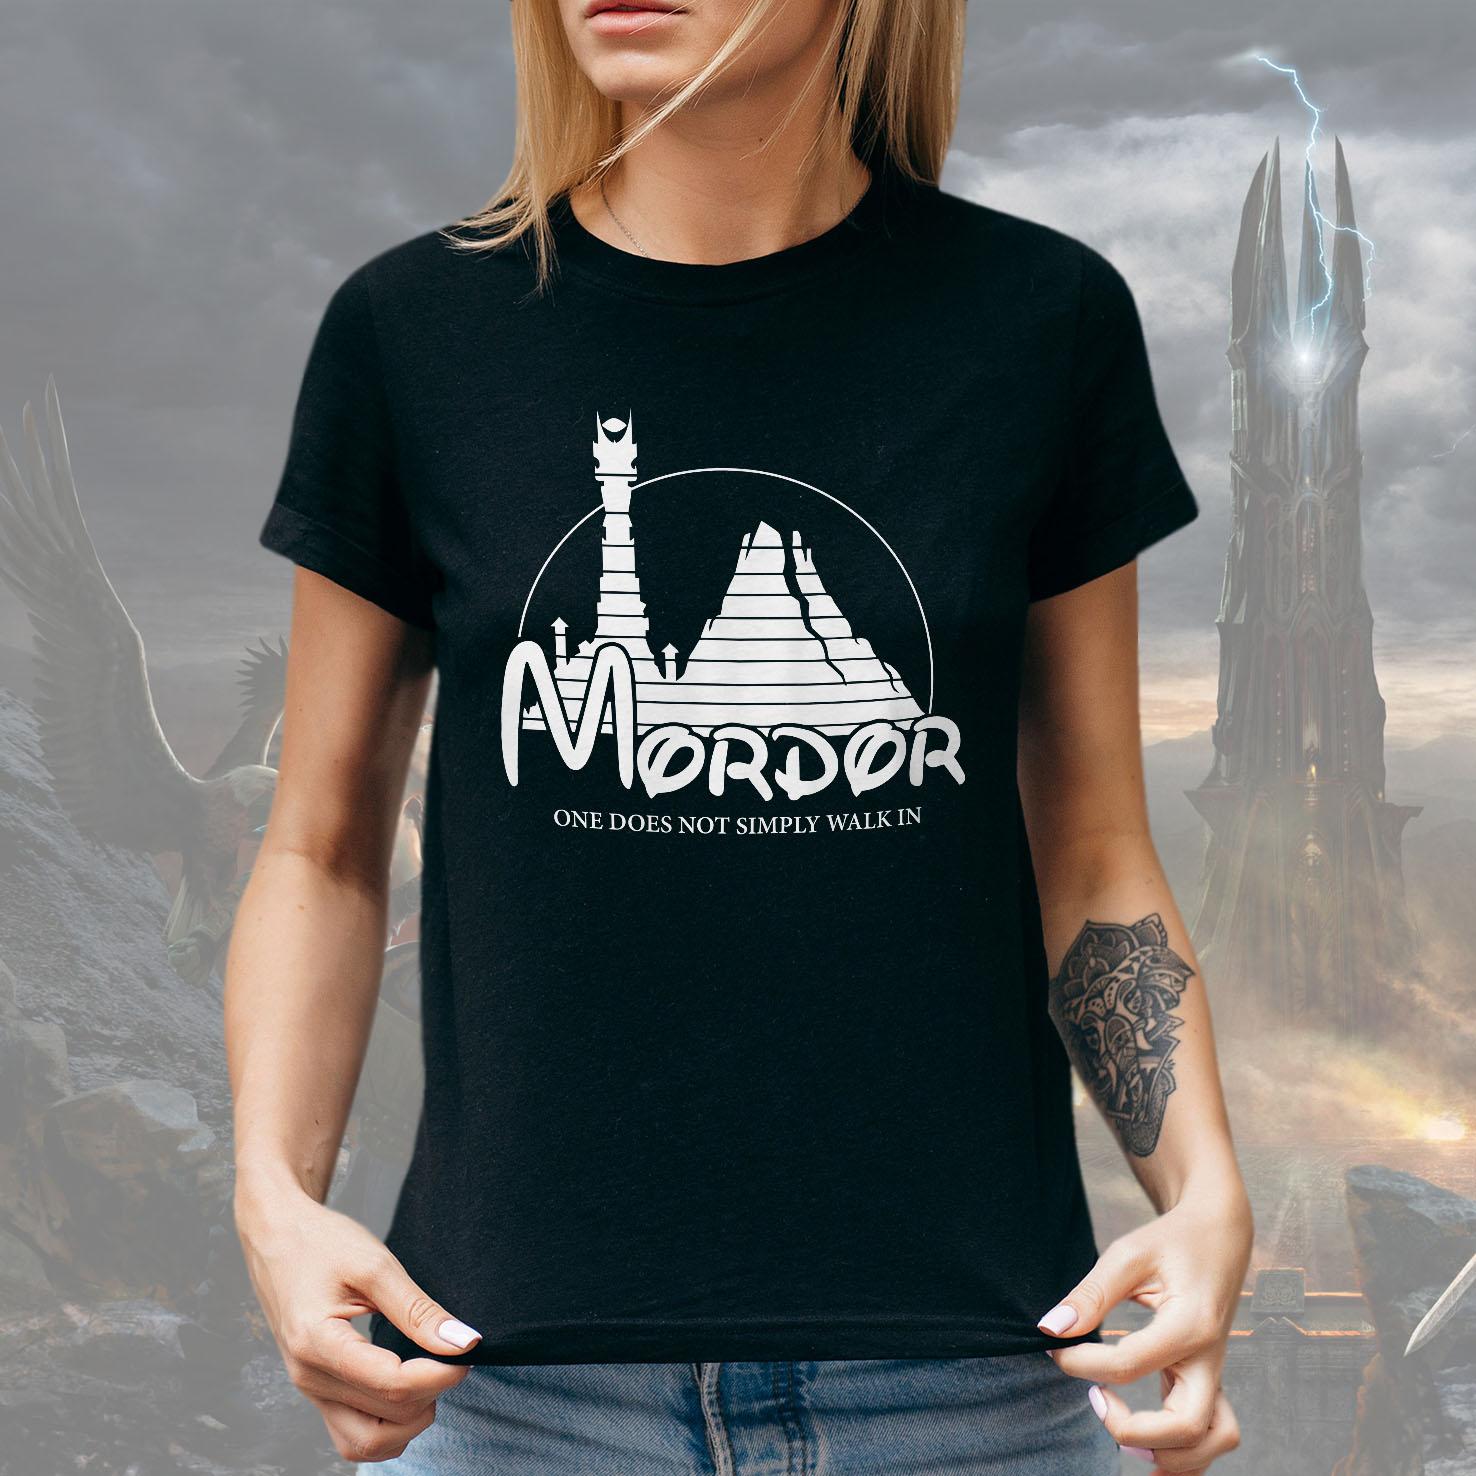 Camiseta Feminina Unissex Mordor One Does Not Simply Walk In Lord Of The Rings Disney O Senhor Dos Anéis (Preta) - EV